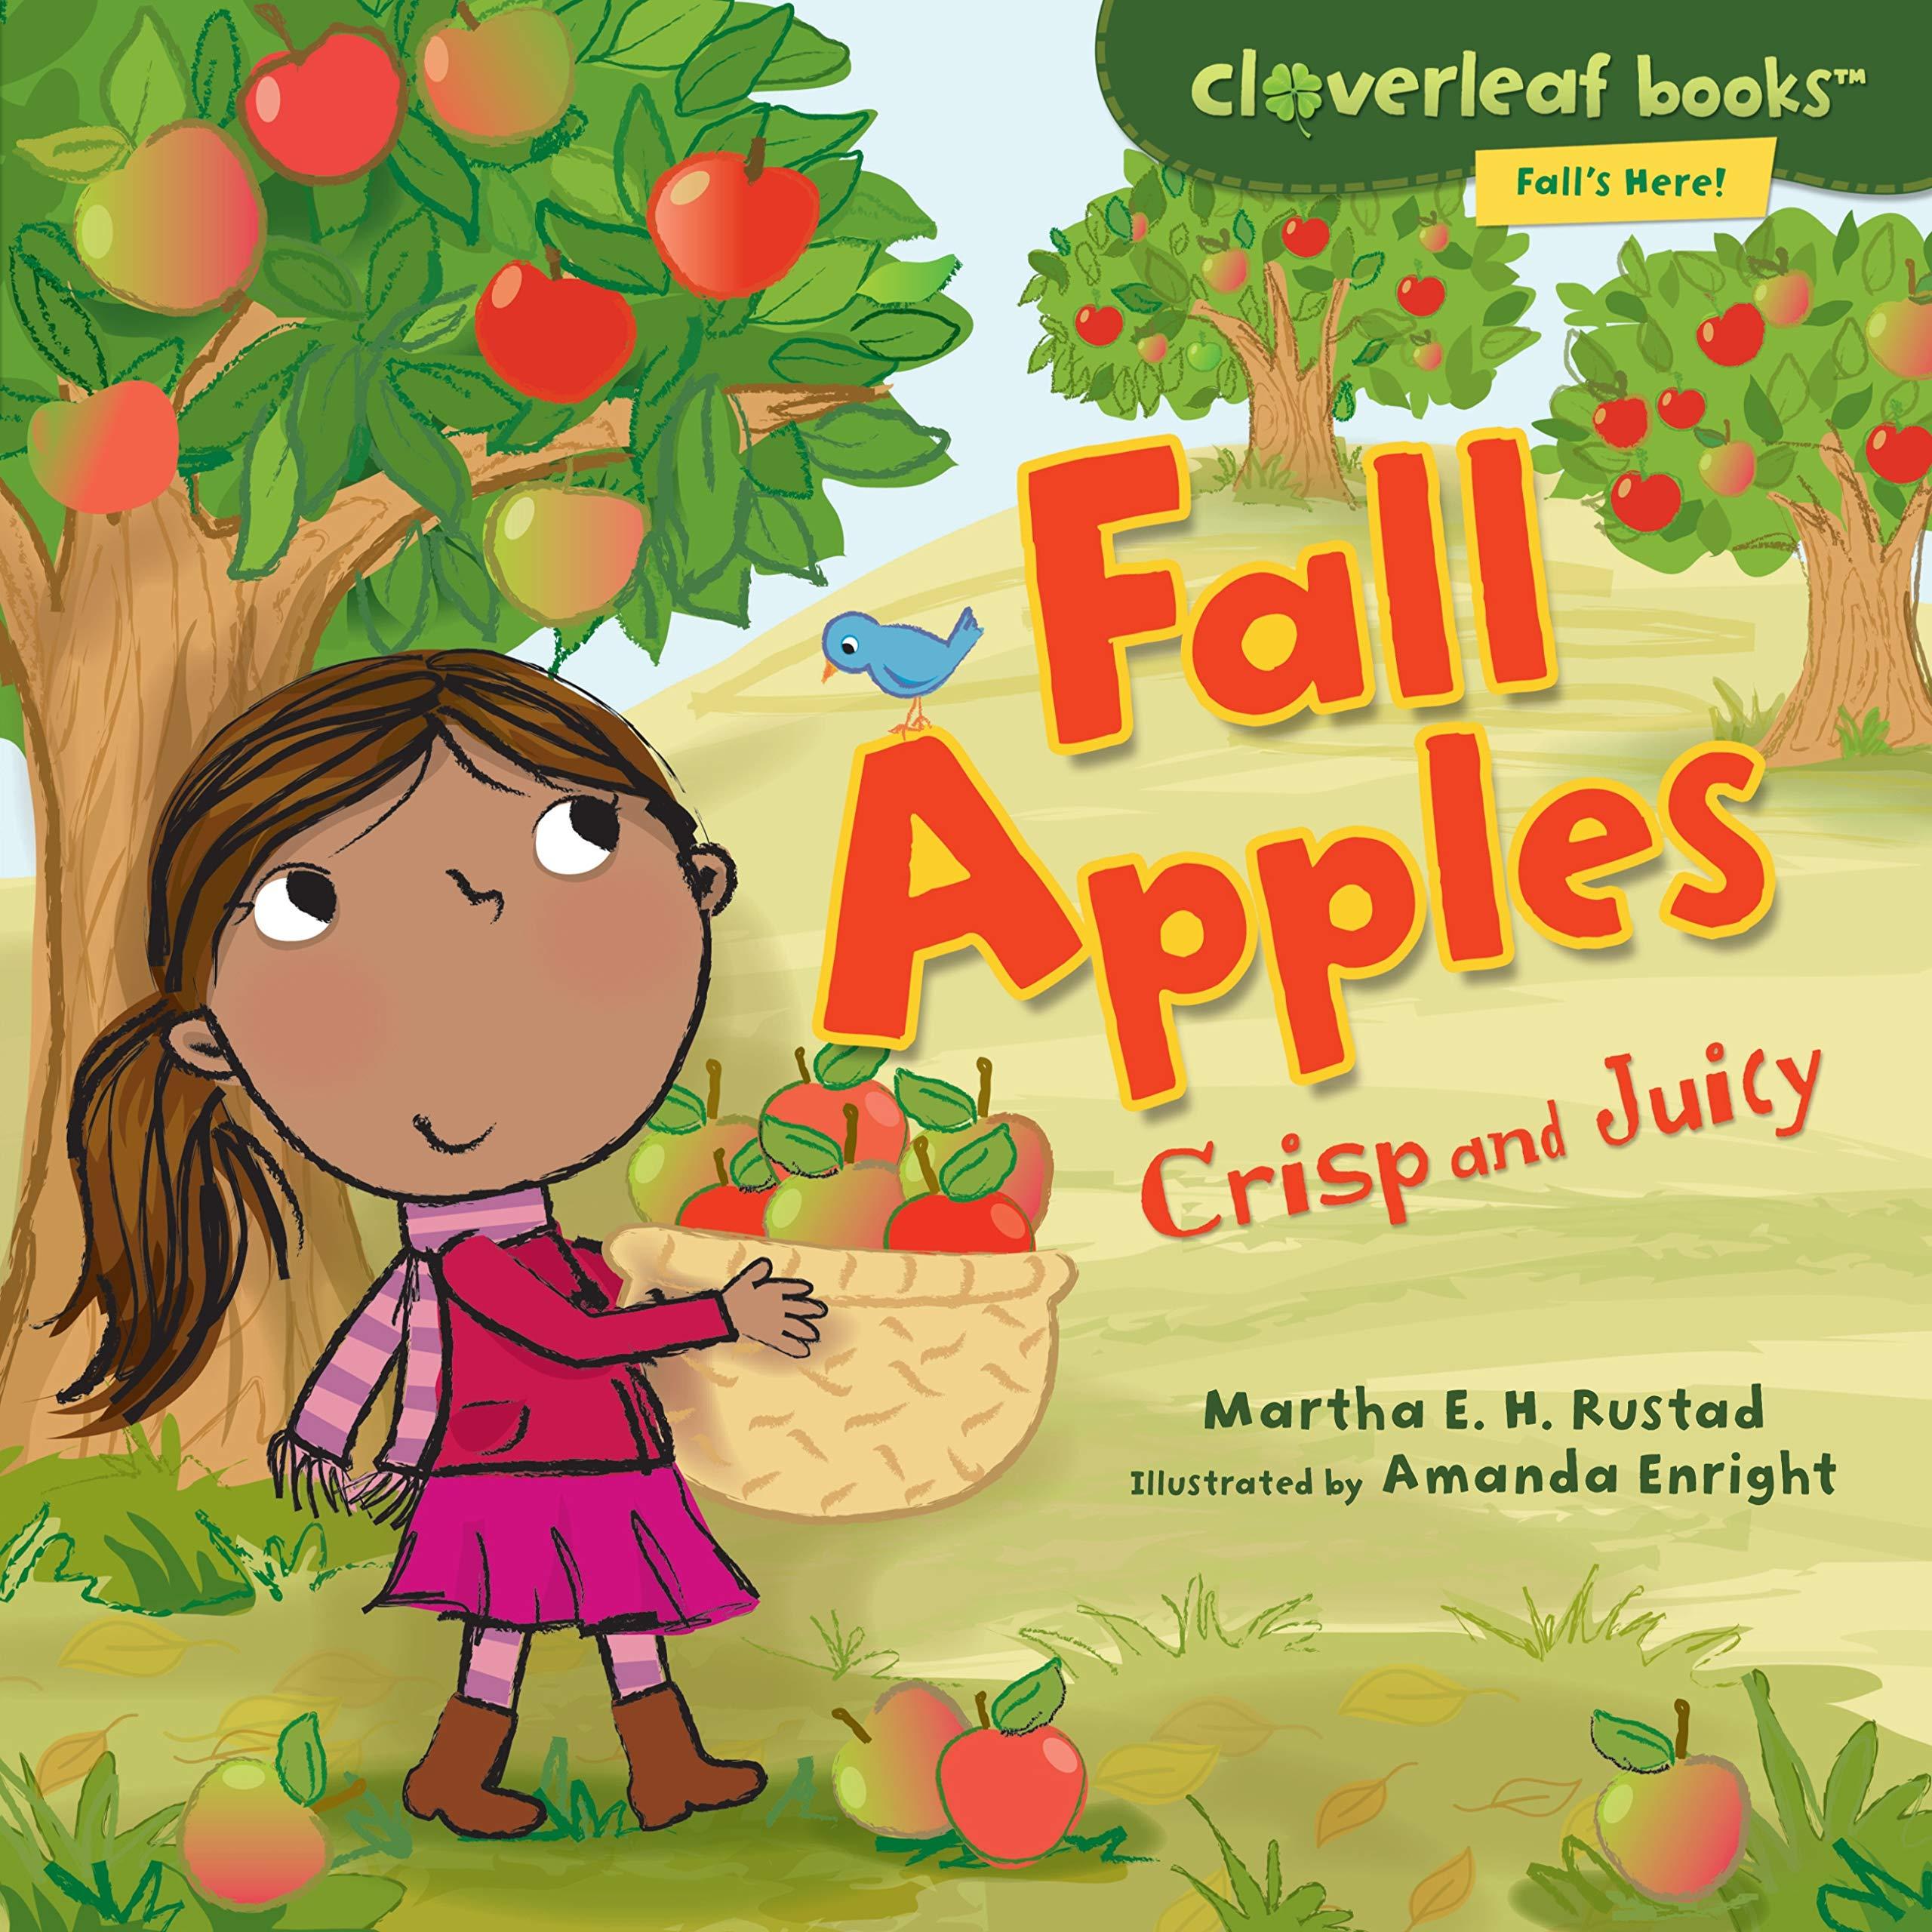 Fall Apples: Crisp and Juicy (Cloverleaf Books: Fall's Here!) pdf